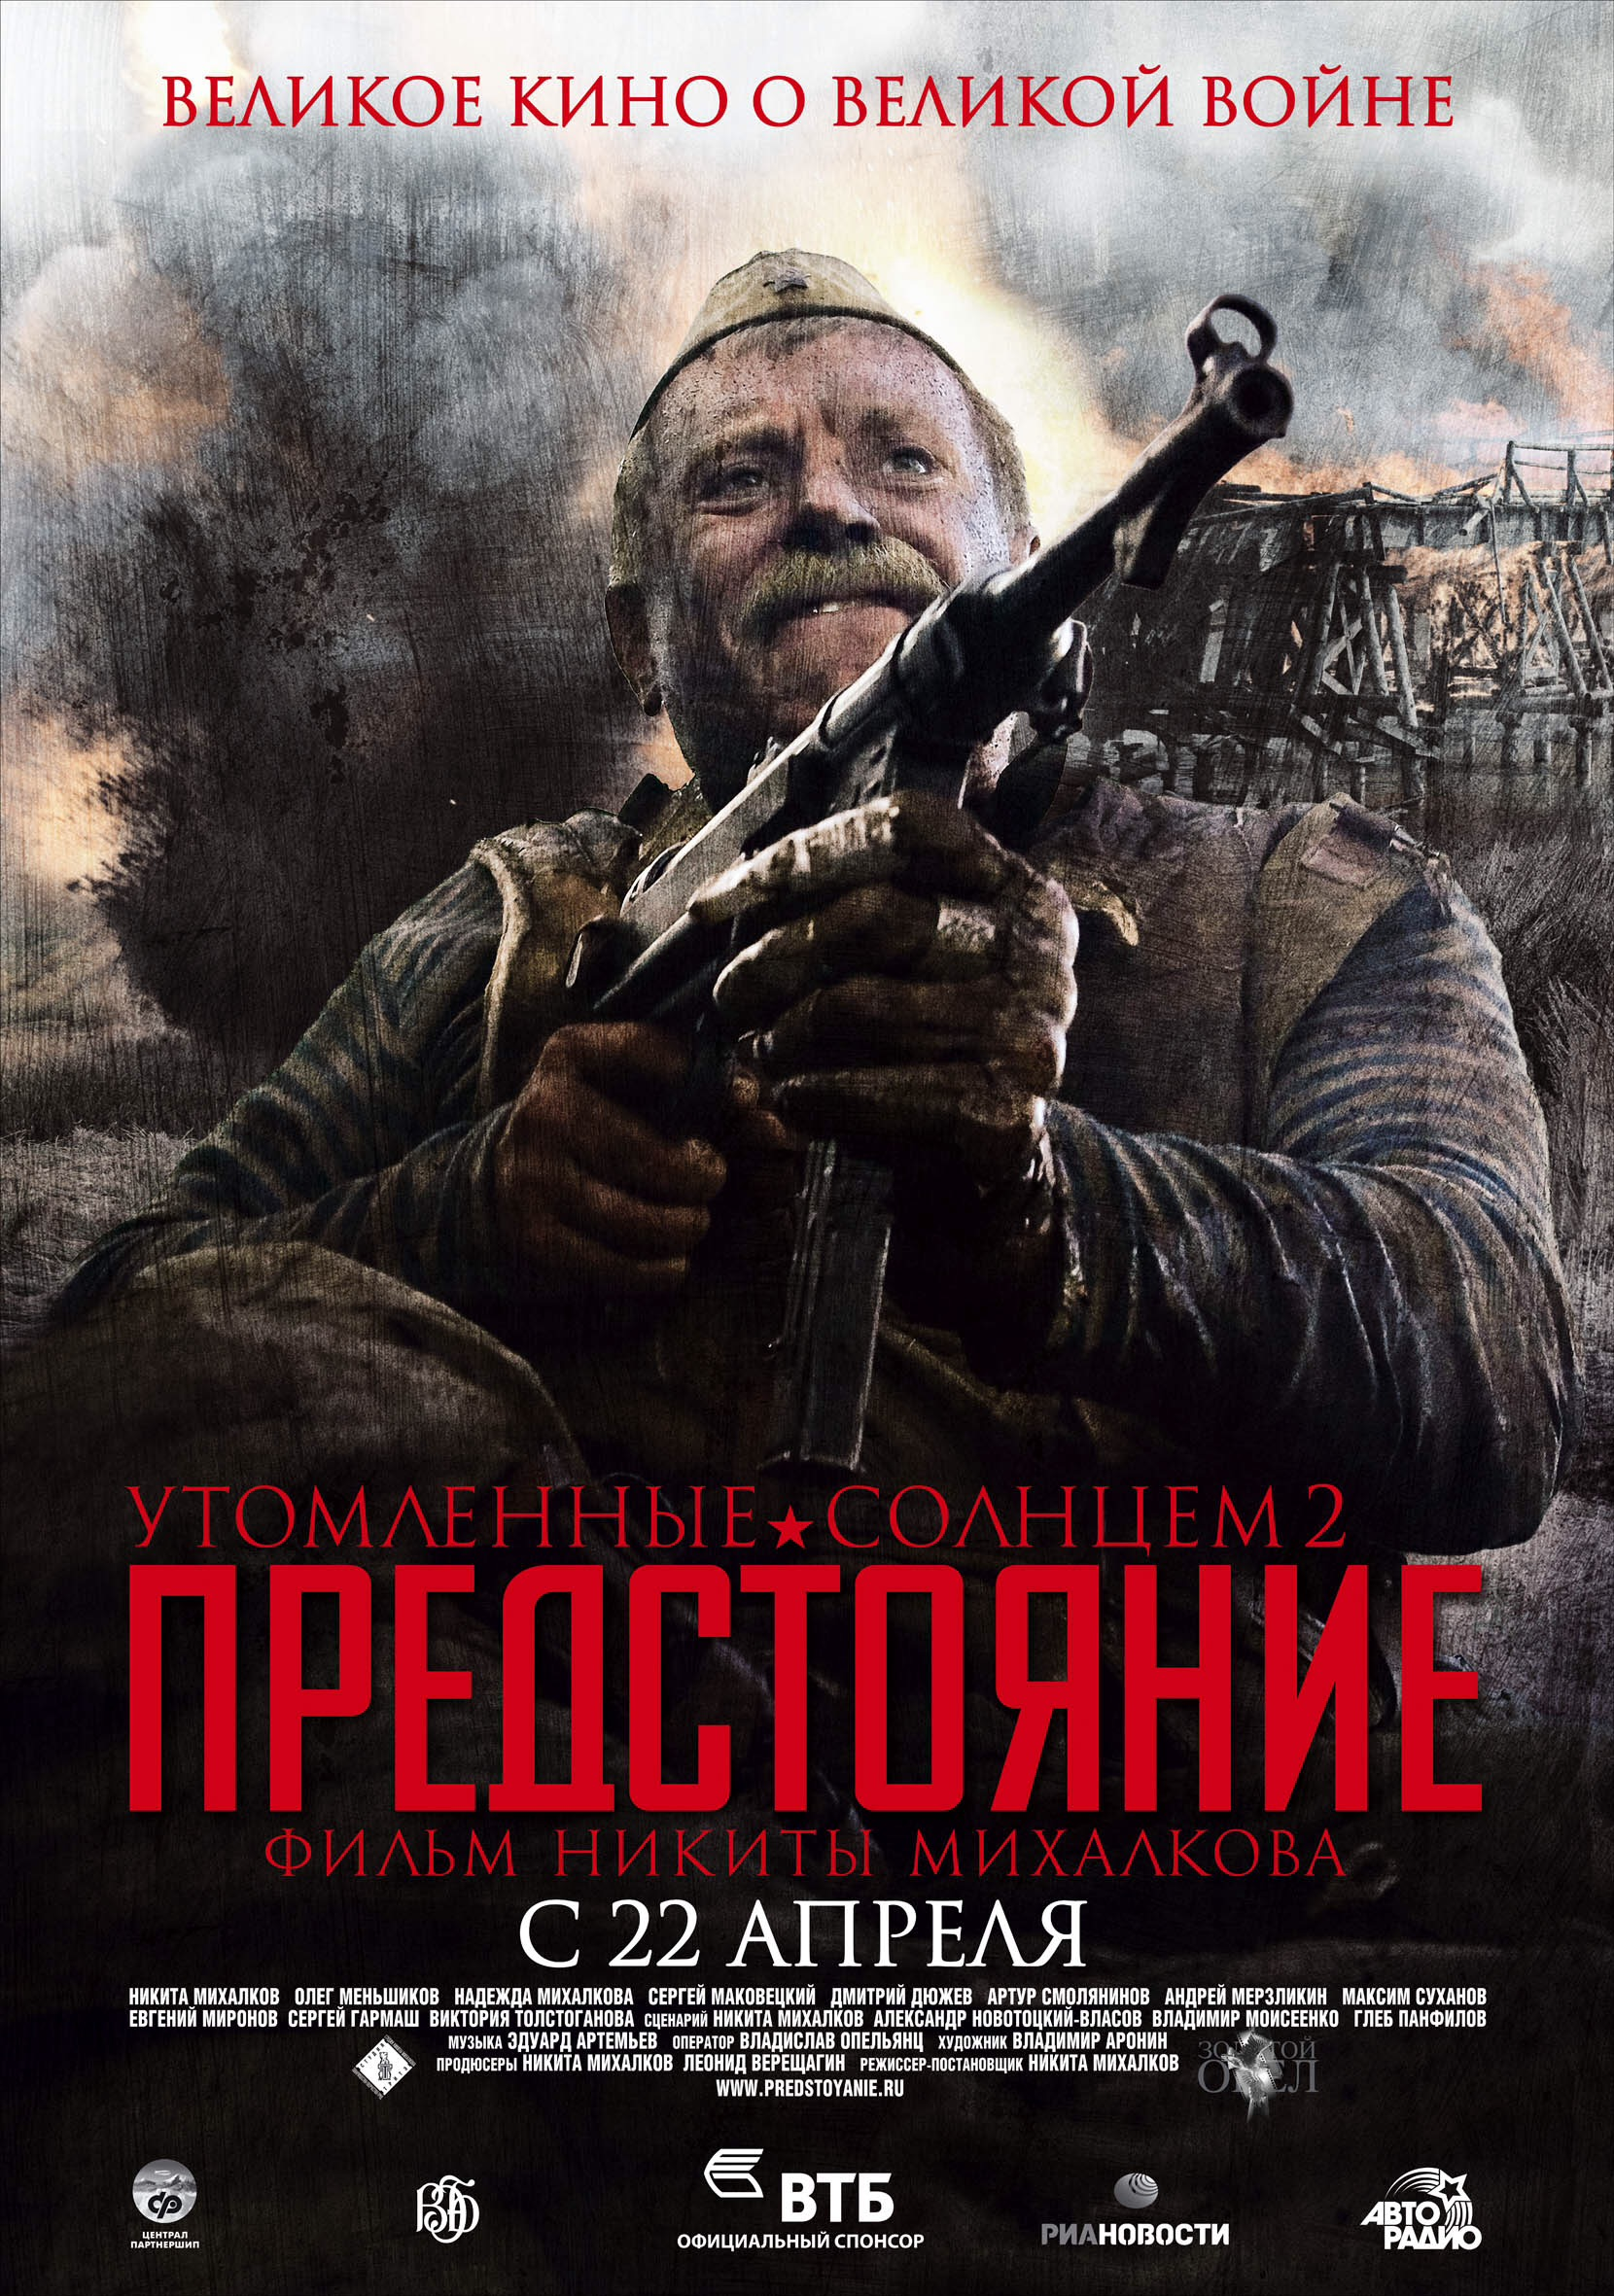 Filme nikita mikhalkov online dating